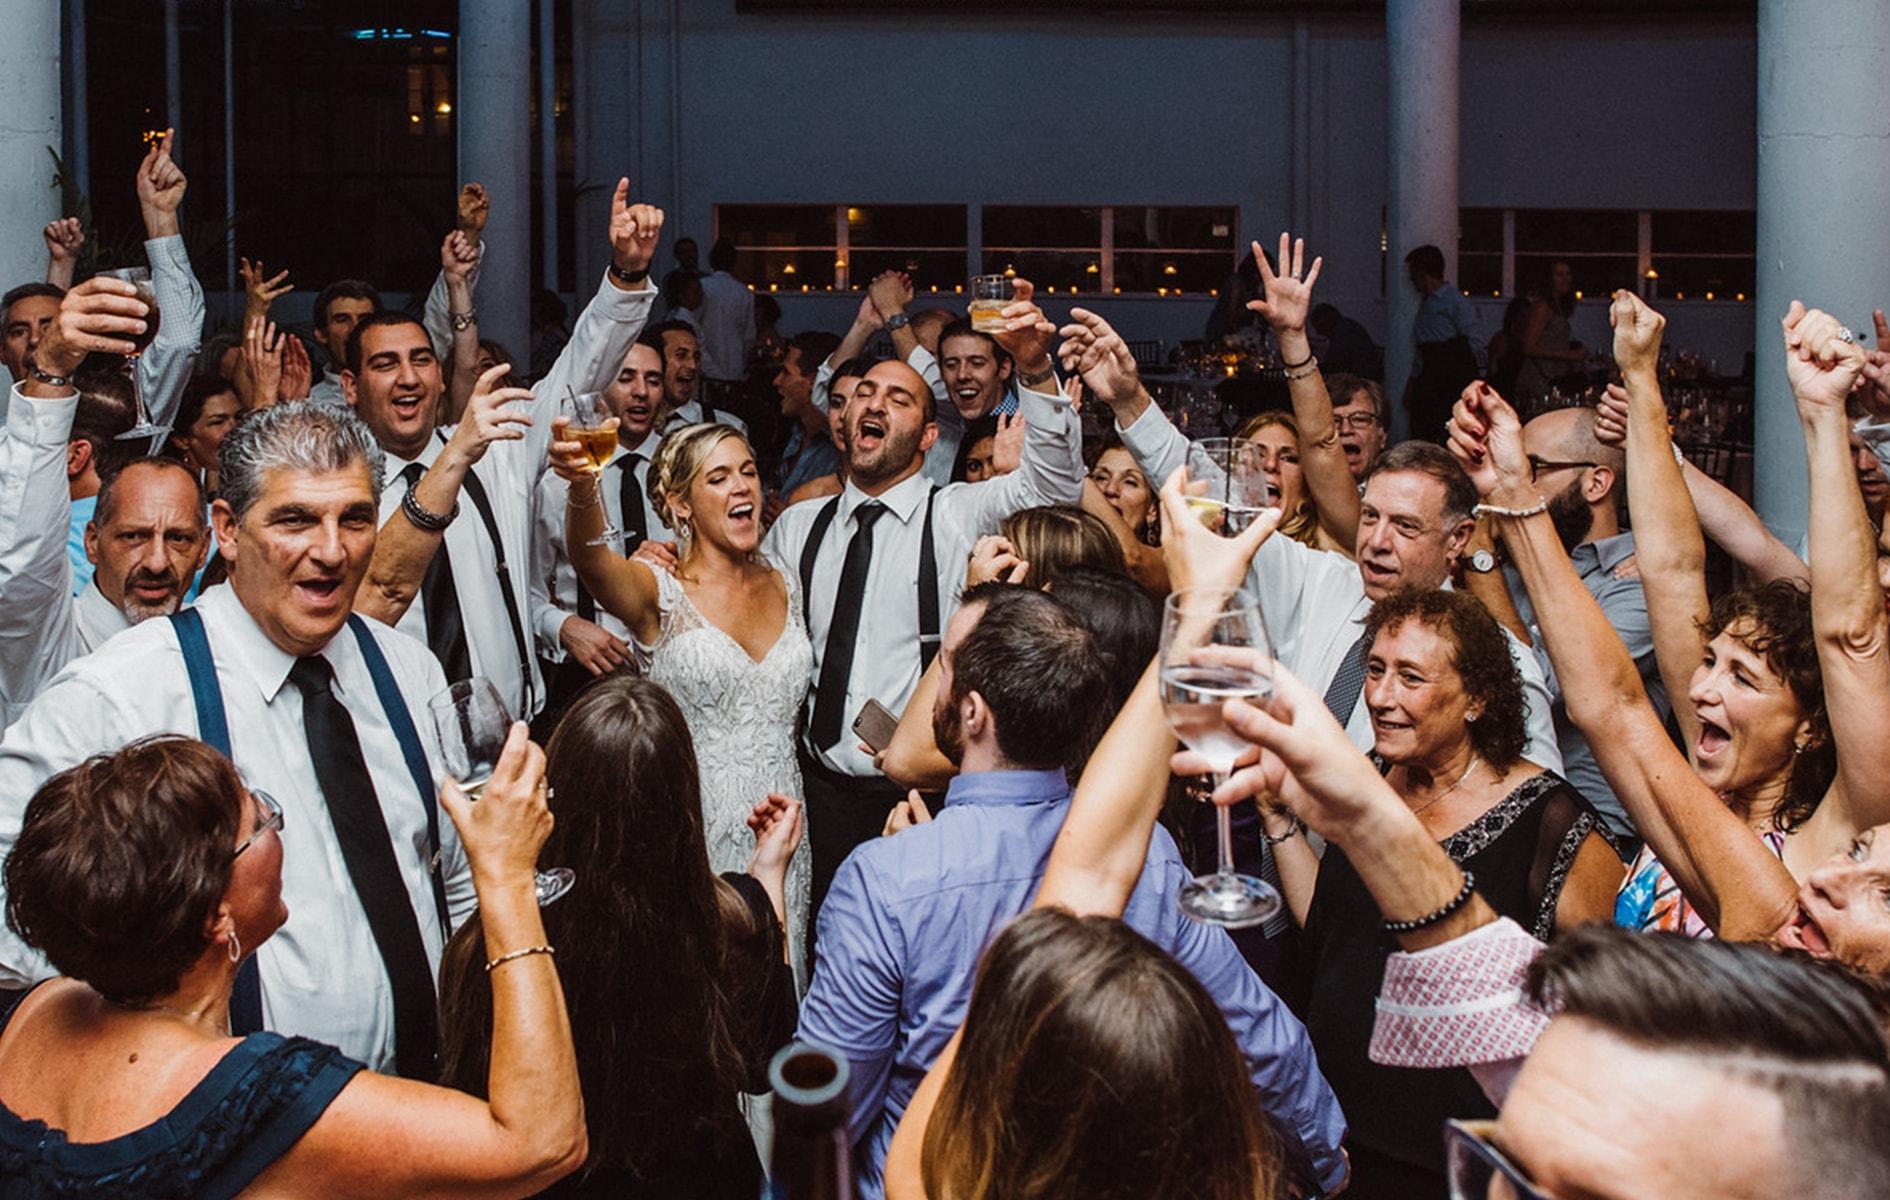 bride and groom dancing with friends on dance floor